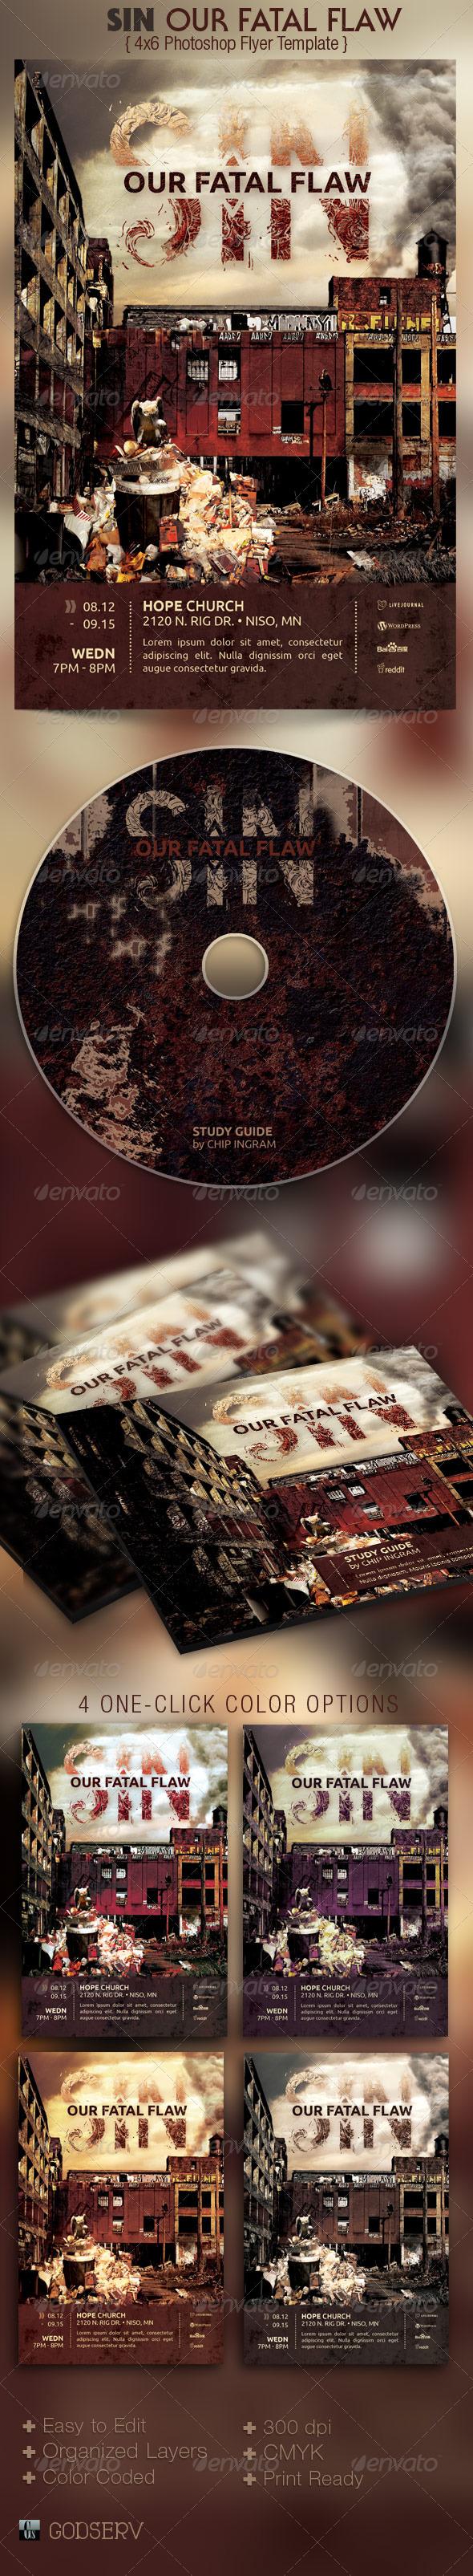 Sin Church Flyer CD Template - Church Flyers